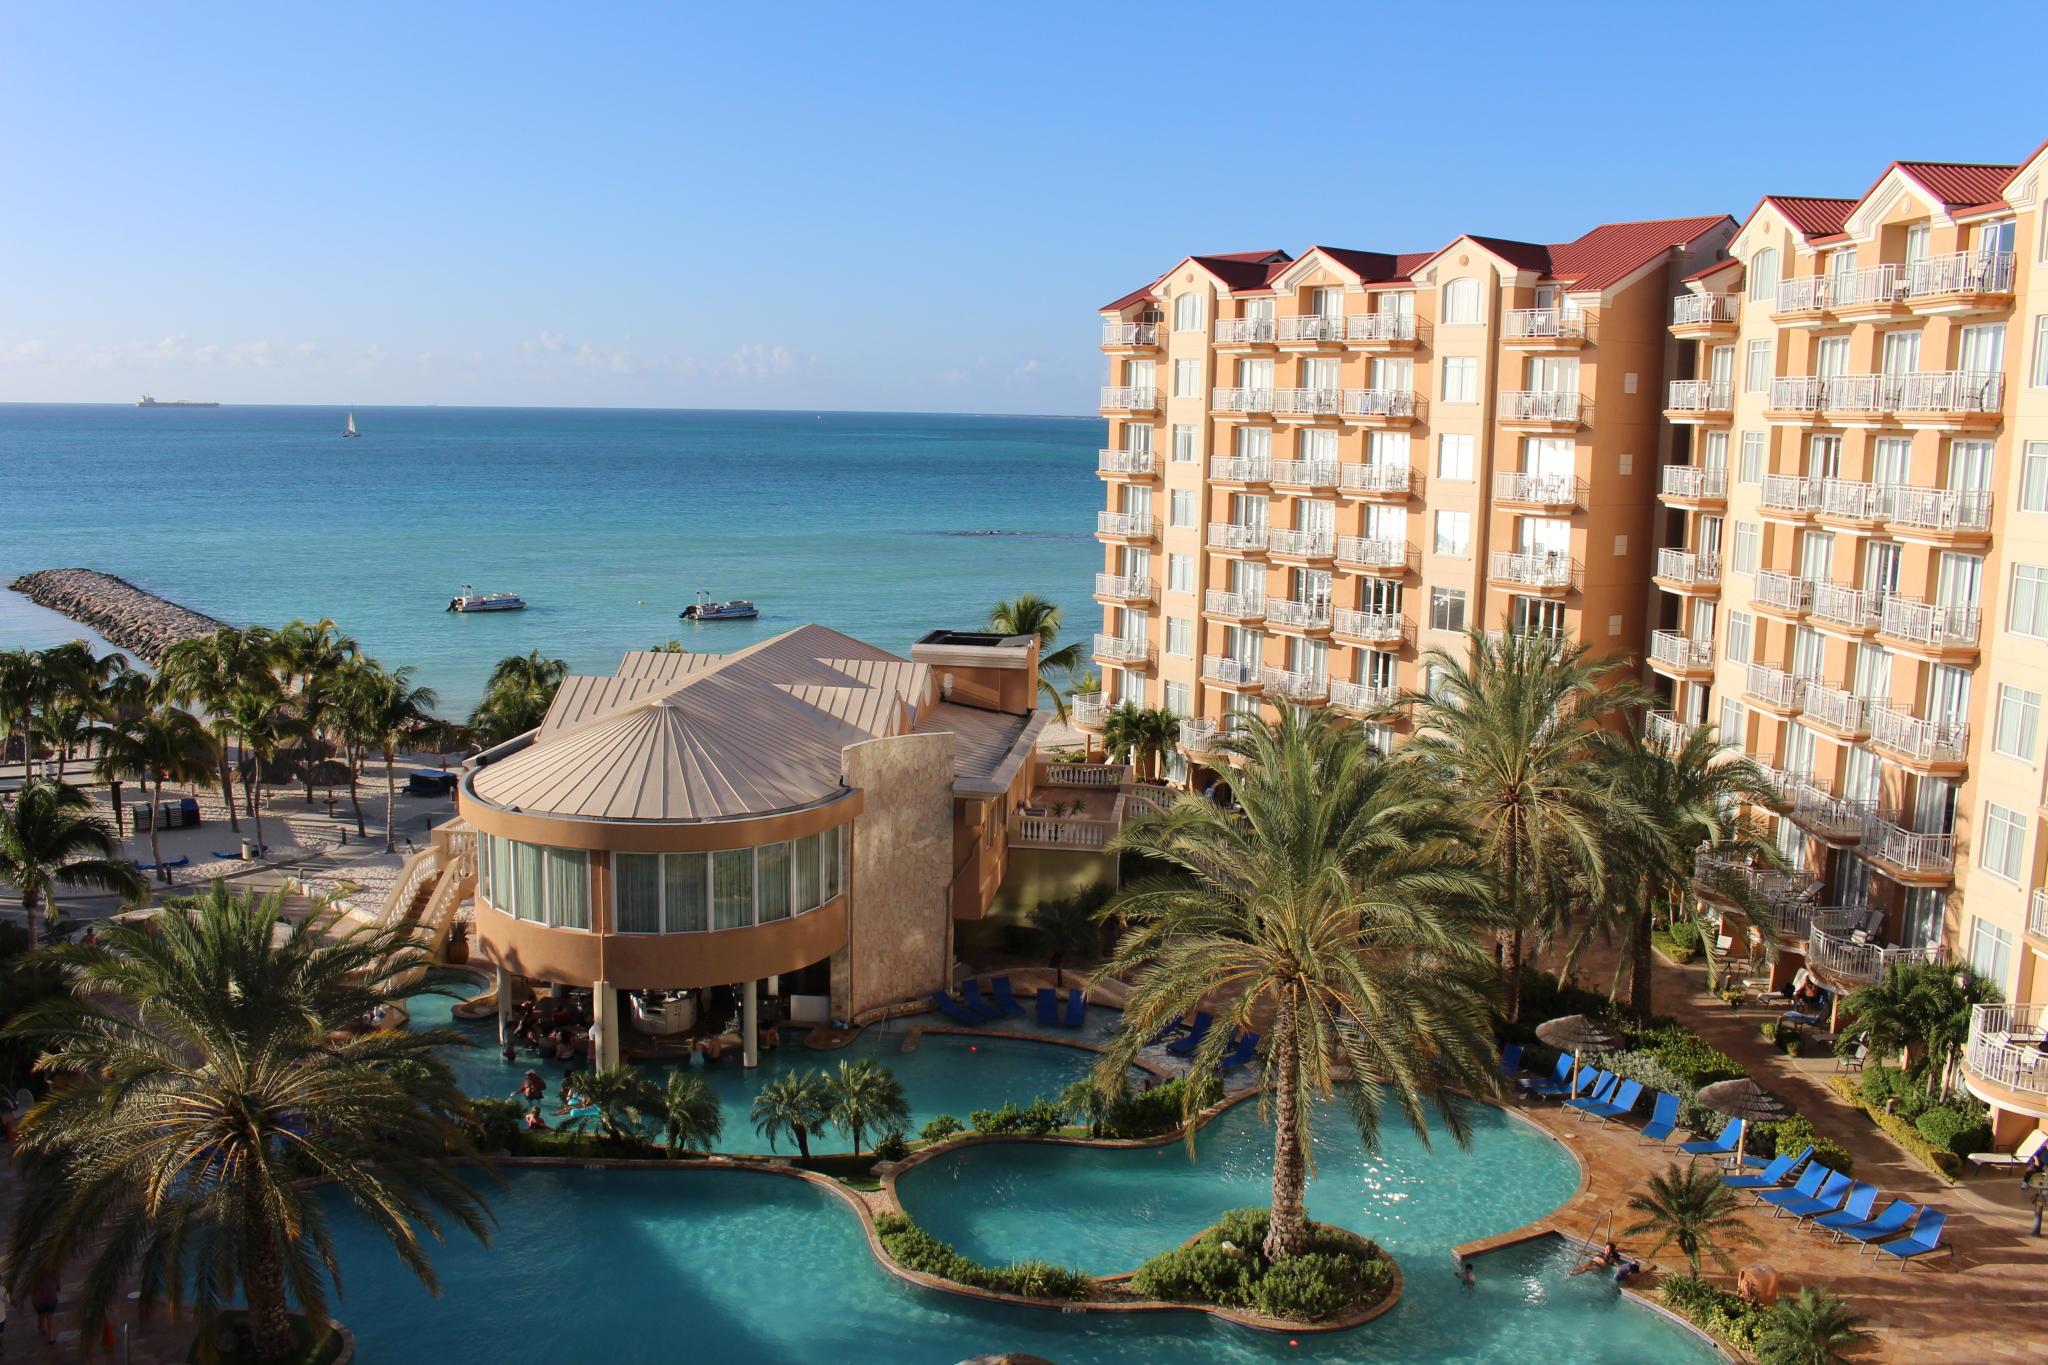 13. Divi Aruba